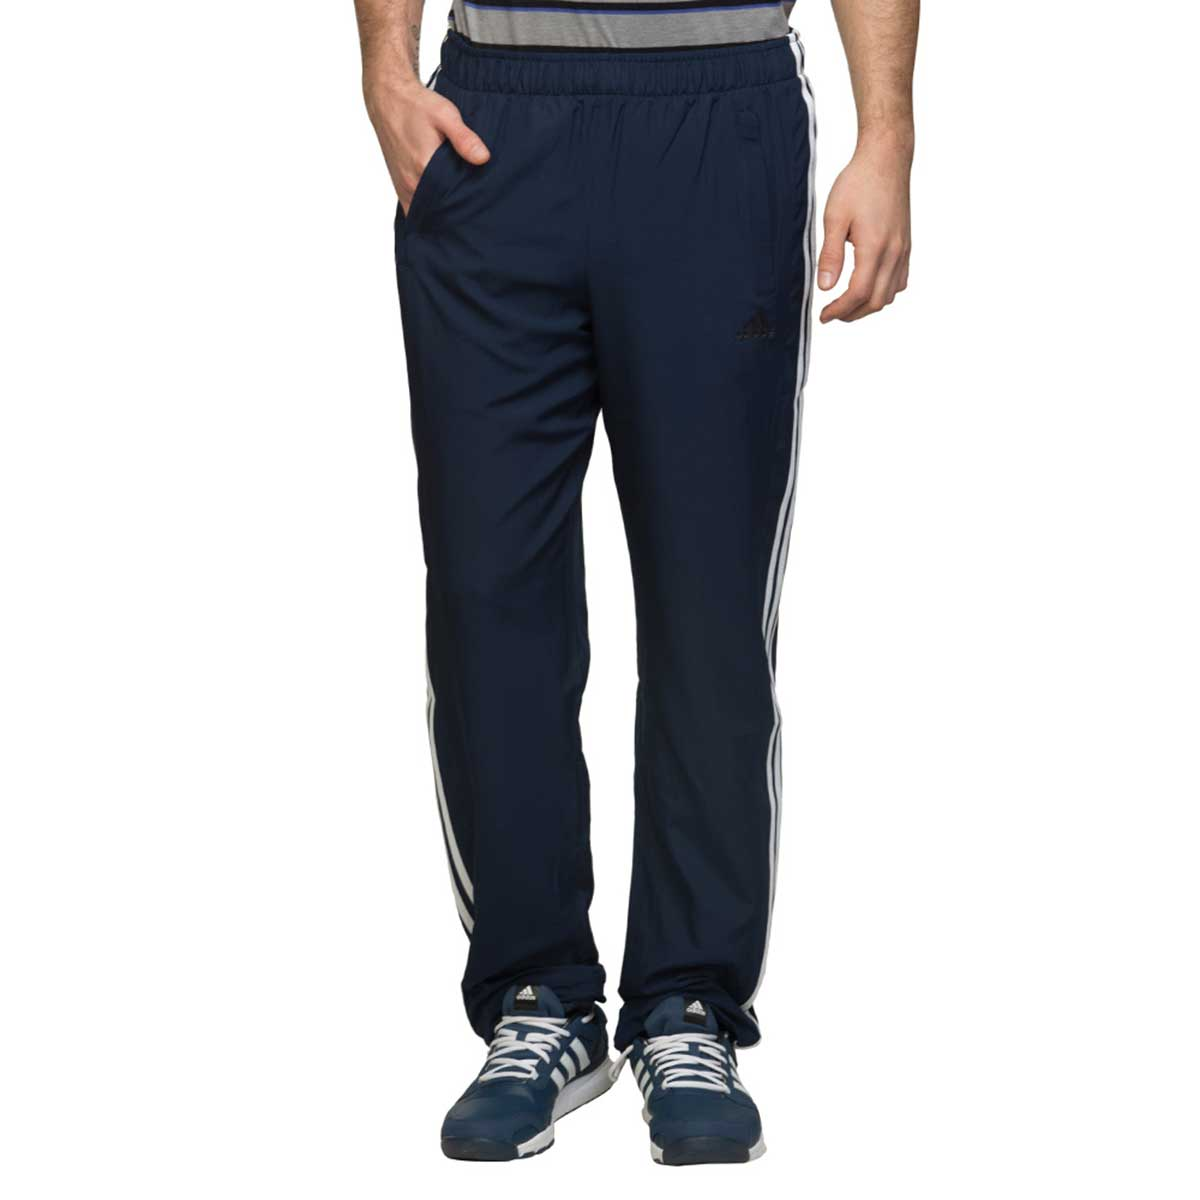 adidas track pants india